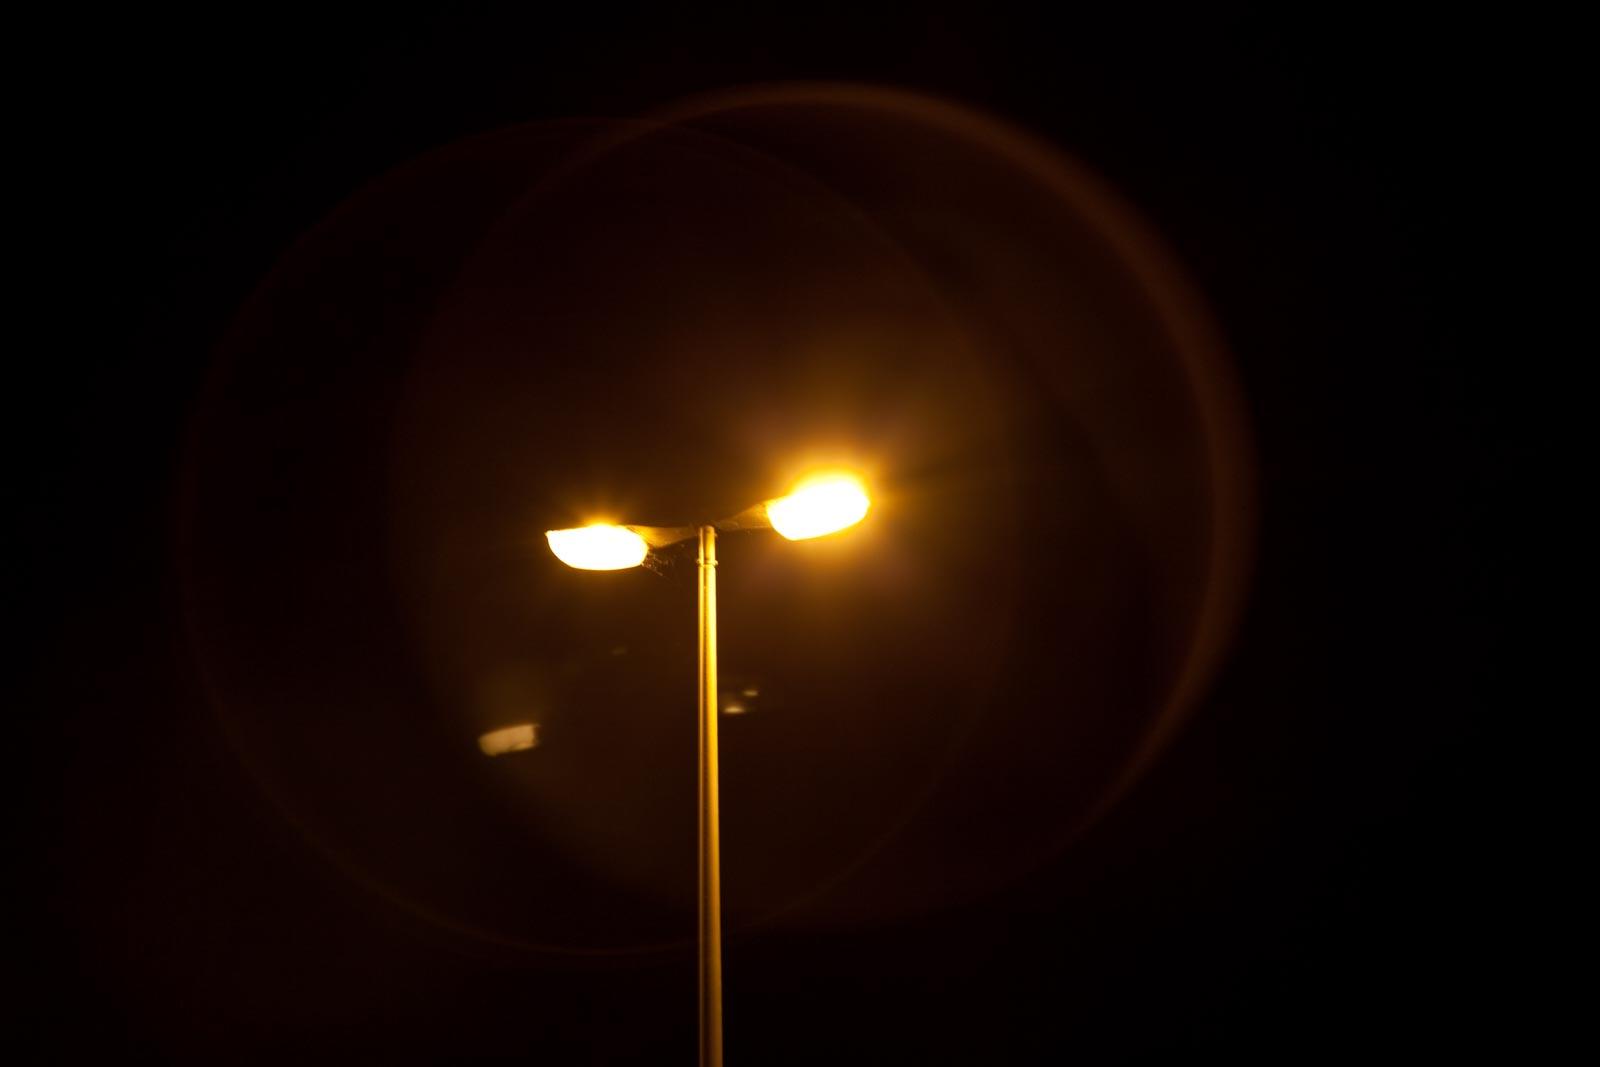 Nachtfoto met lensfrair van filter rond lantarenpaal